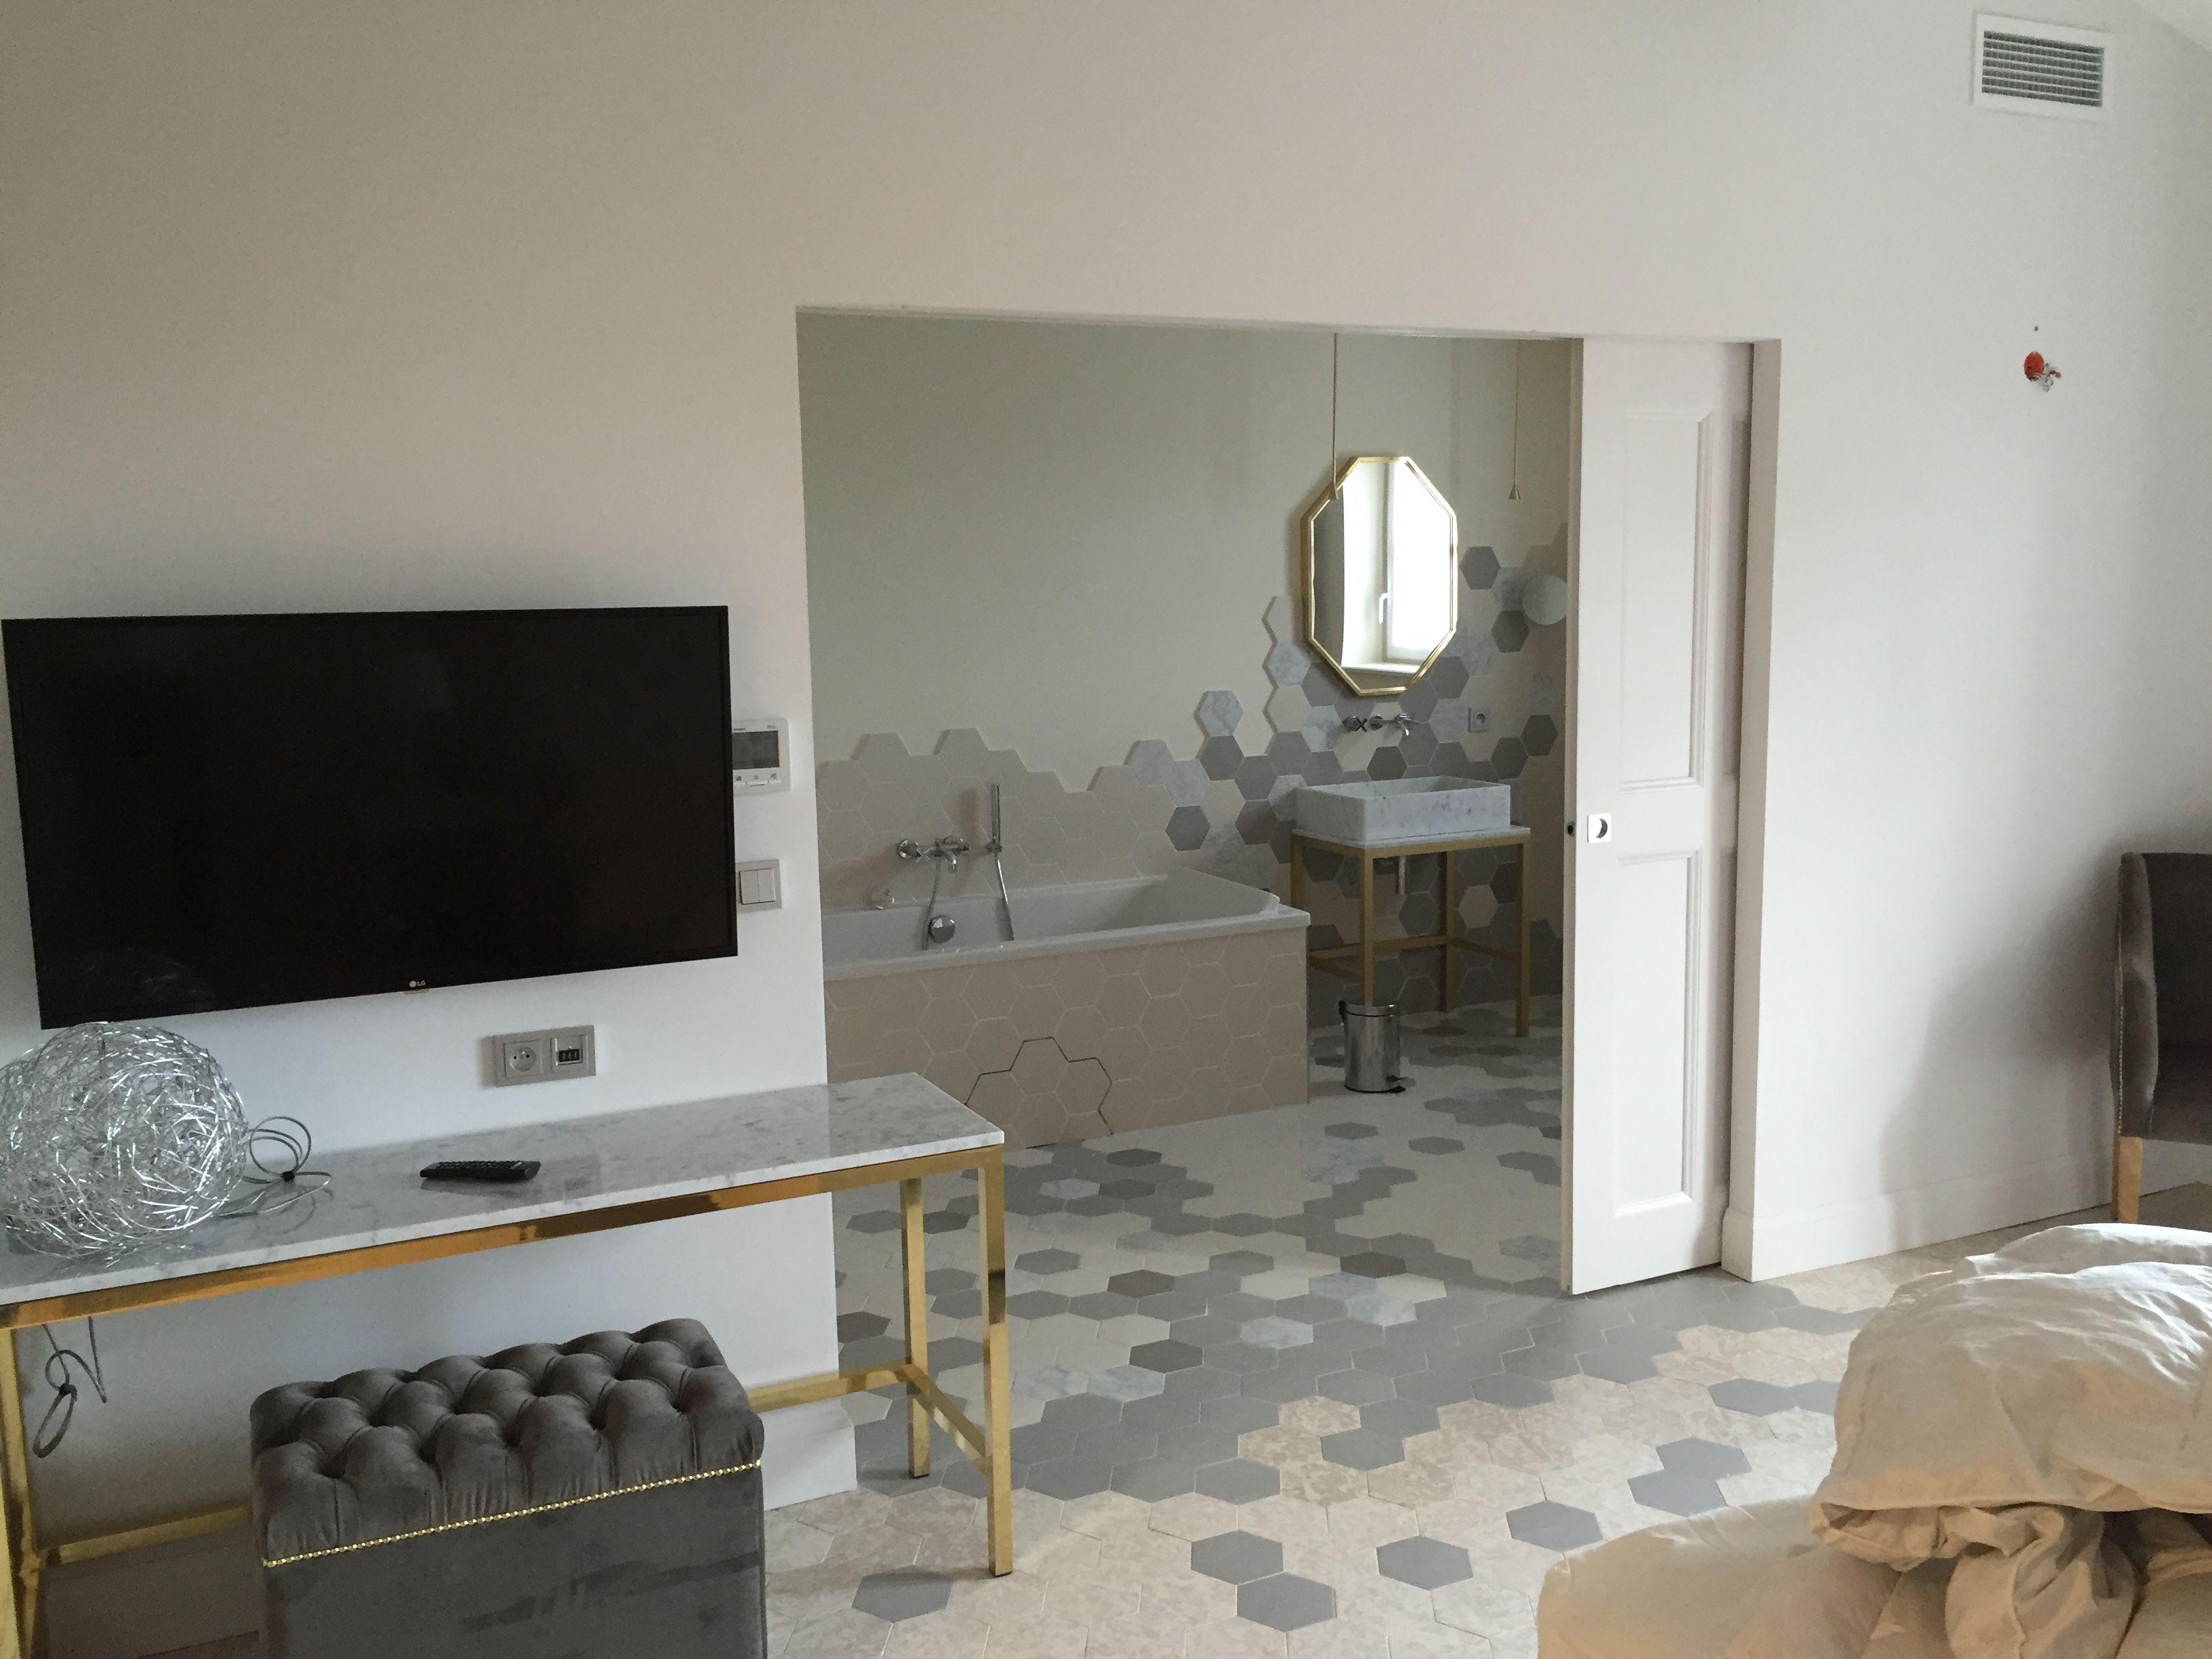 carrelage poitiers excellent nettoyer joint salle de bain amazing carrelage noir poitiers with. Black Bedroom Furniture Sets. Home Design Ideas